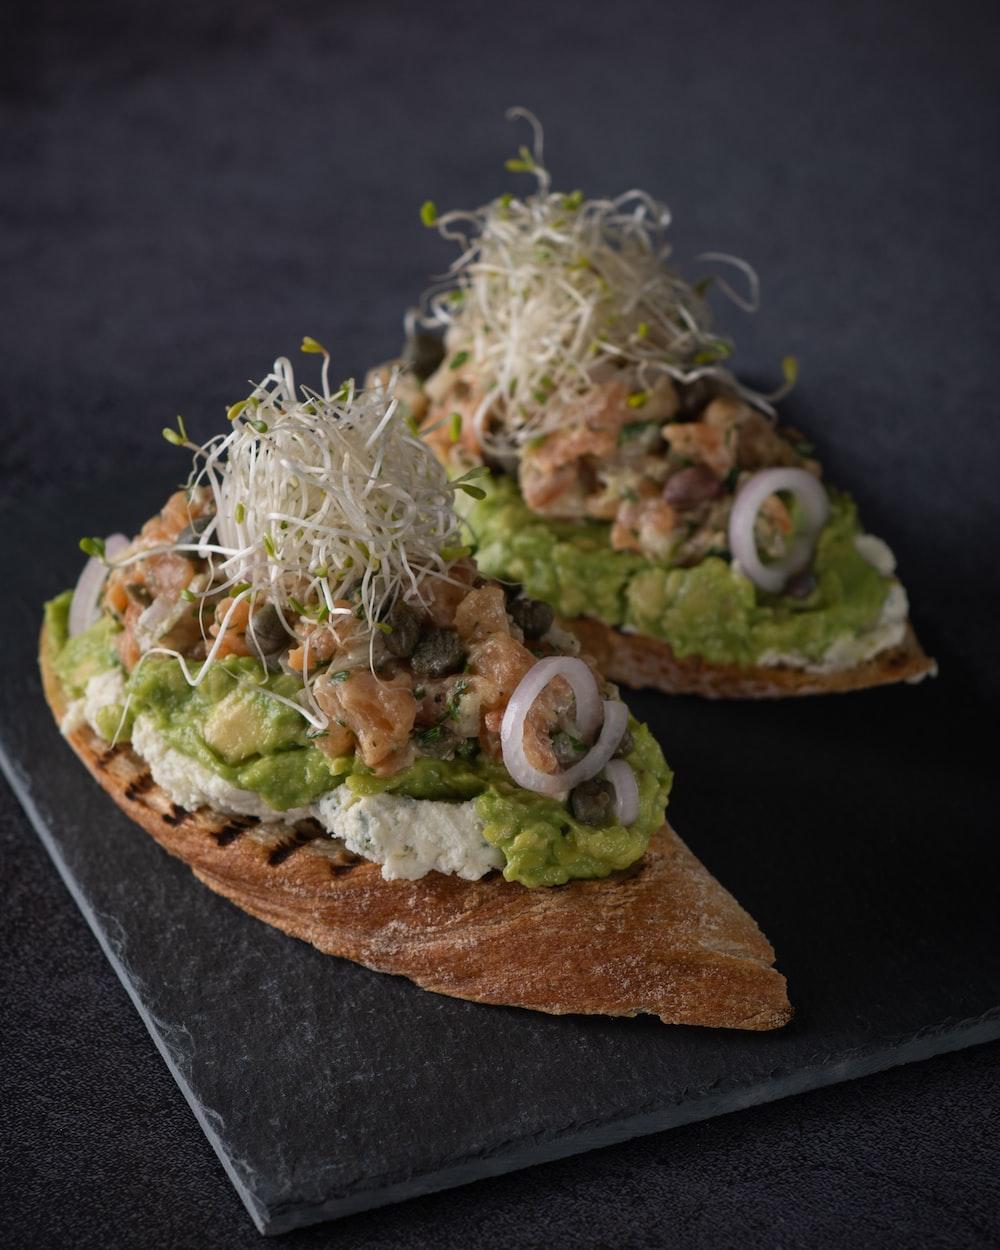 green vegetable salad on brown bread